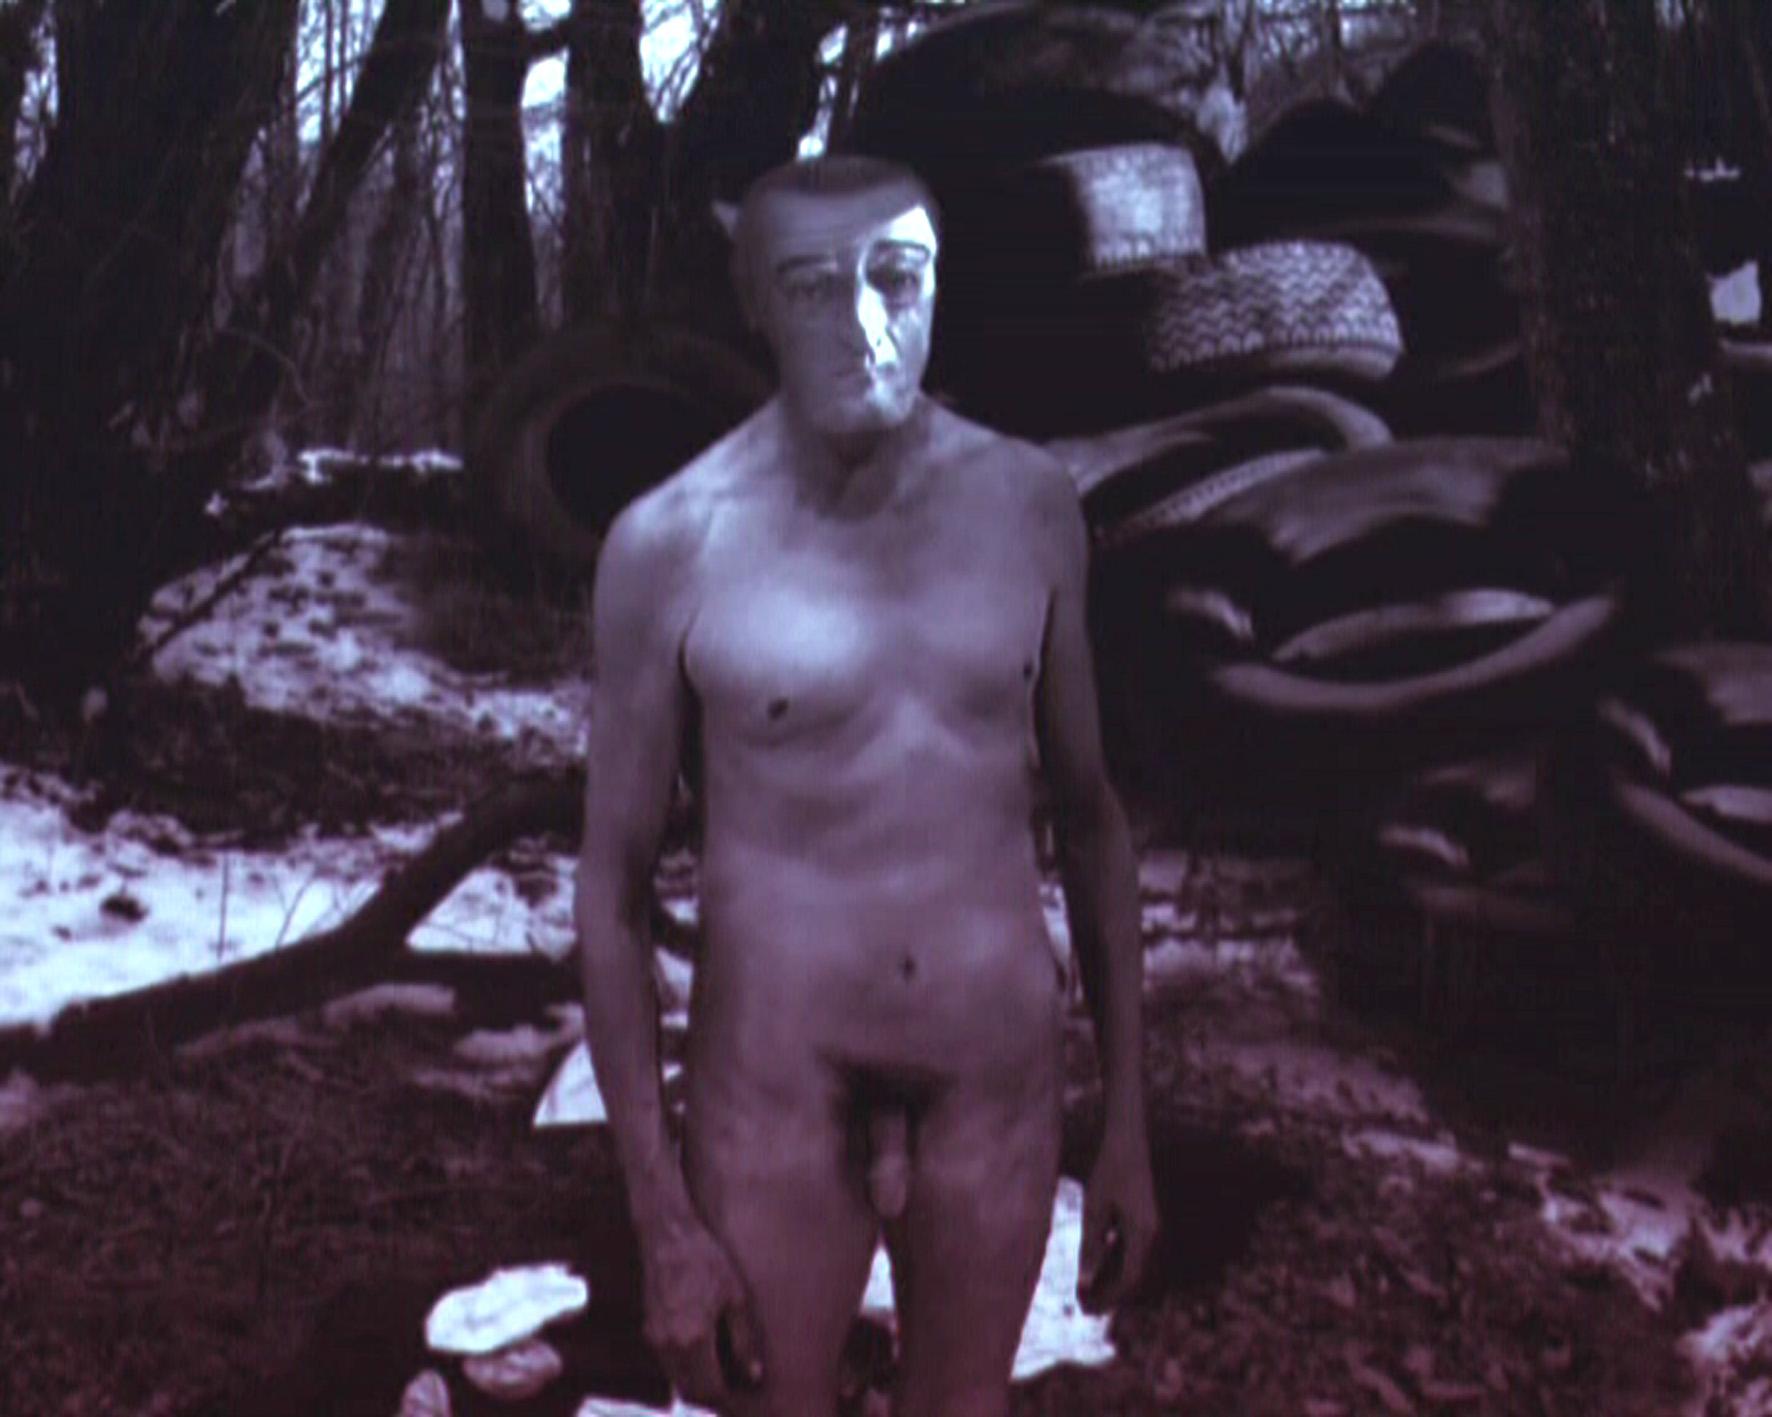 "Diego Perrone Totò nudo, 2005, Ex. 1/5 Animazione digitale  / 4' 30"" CourtesyMassimo De Carlo, Milano/Londra/Hong Kong"